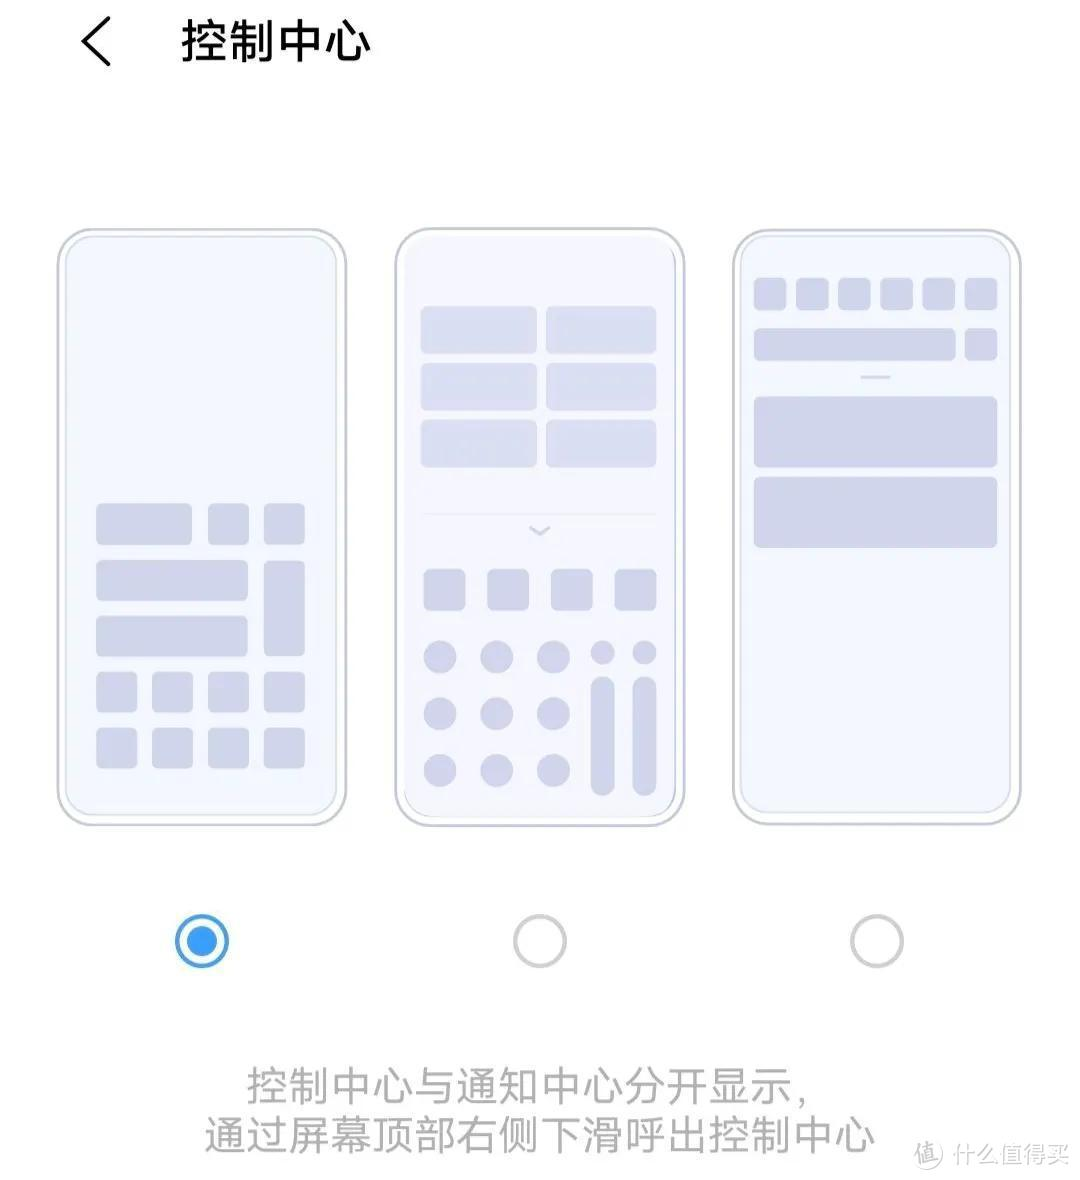 iQOO Neo 855版评测,两年前发布的iQOO Neo 855版现在还好用吗?